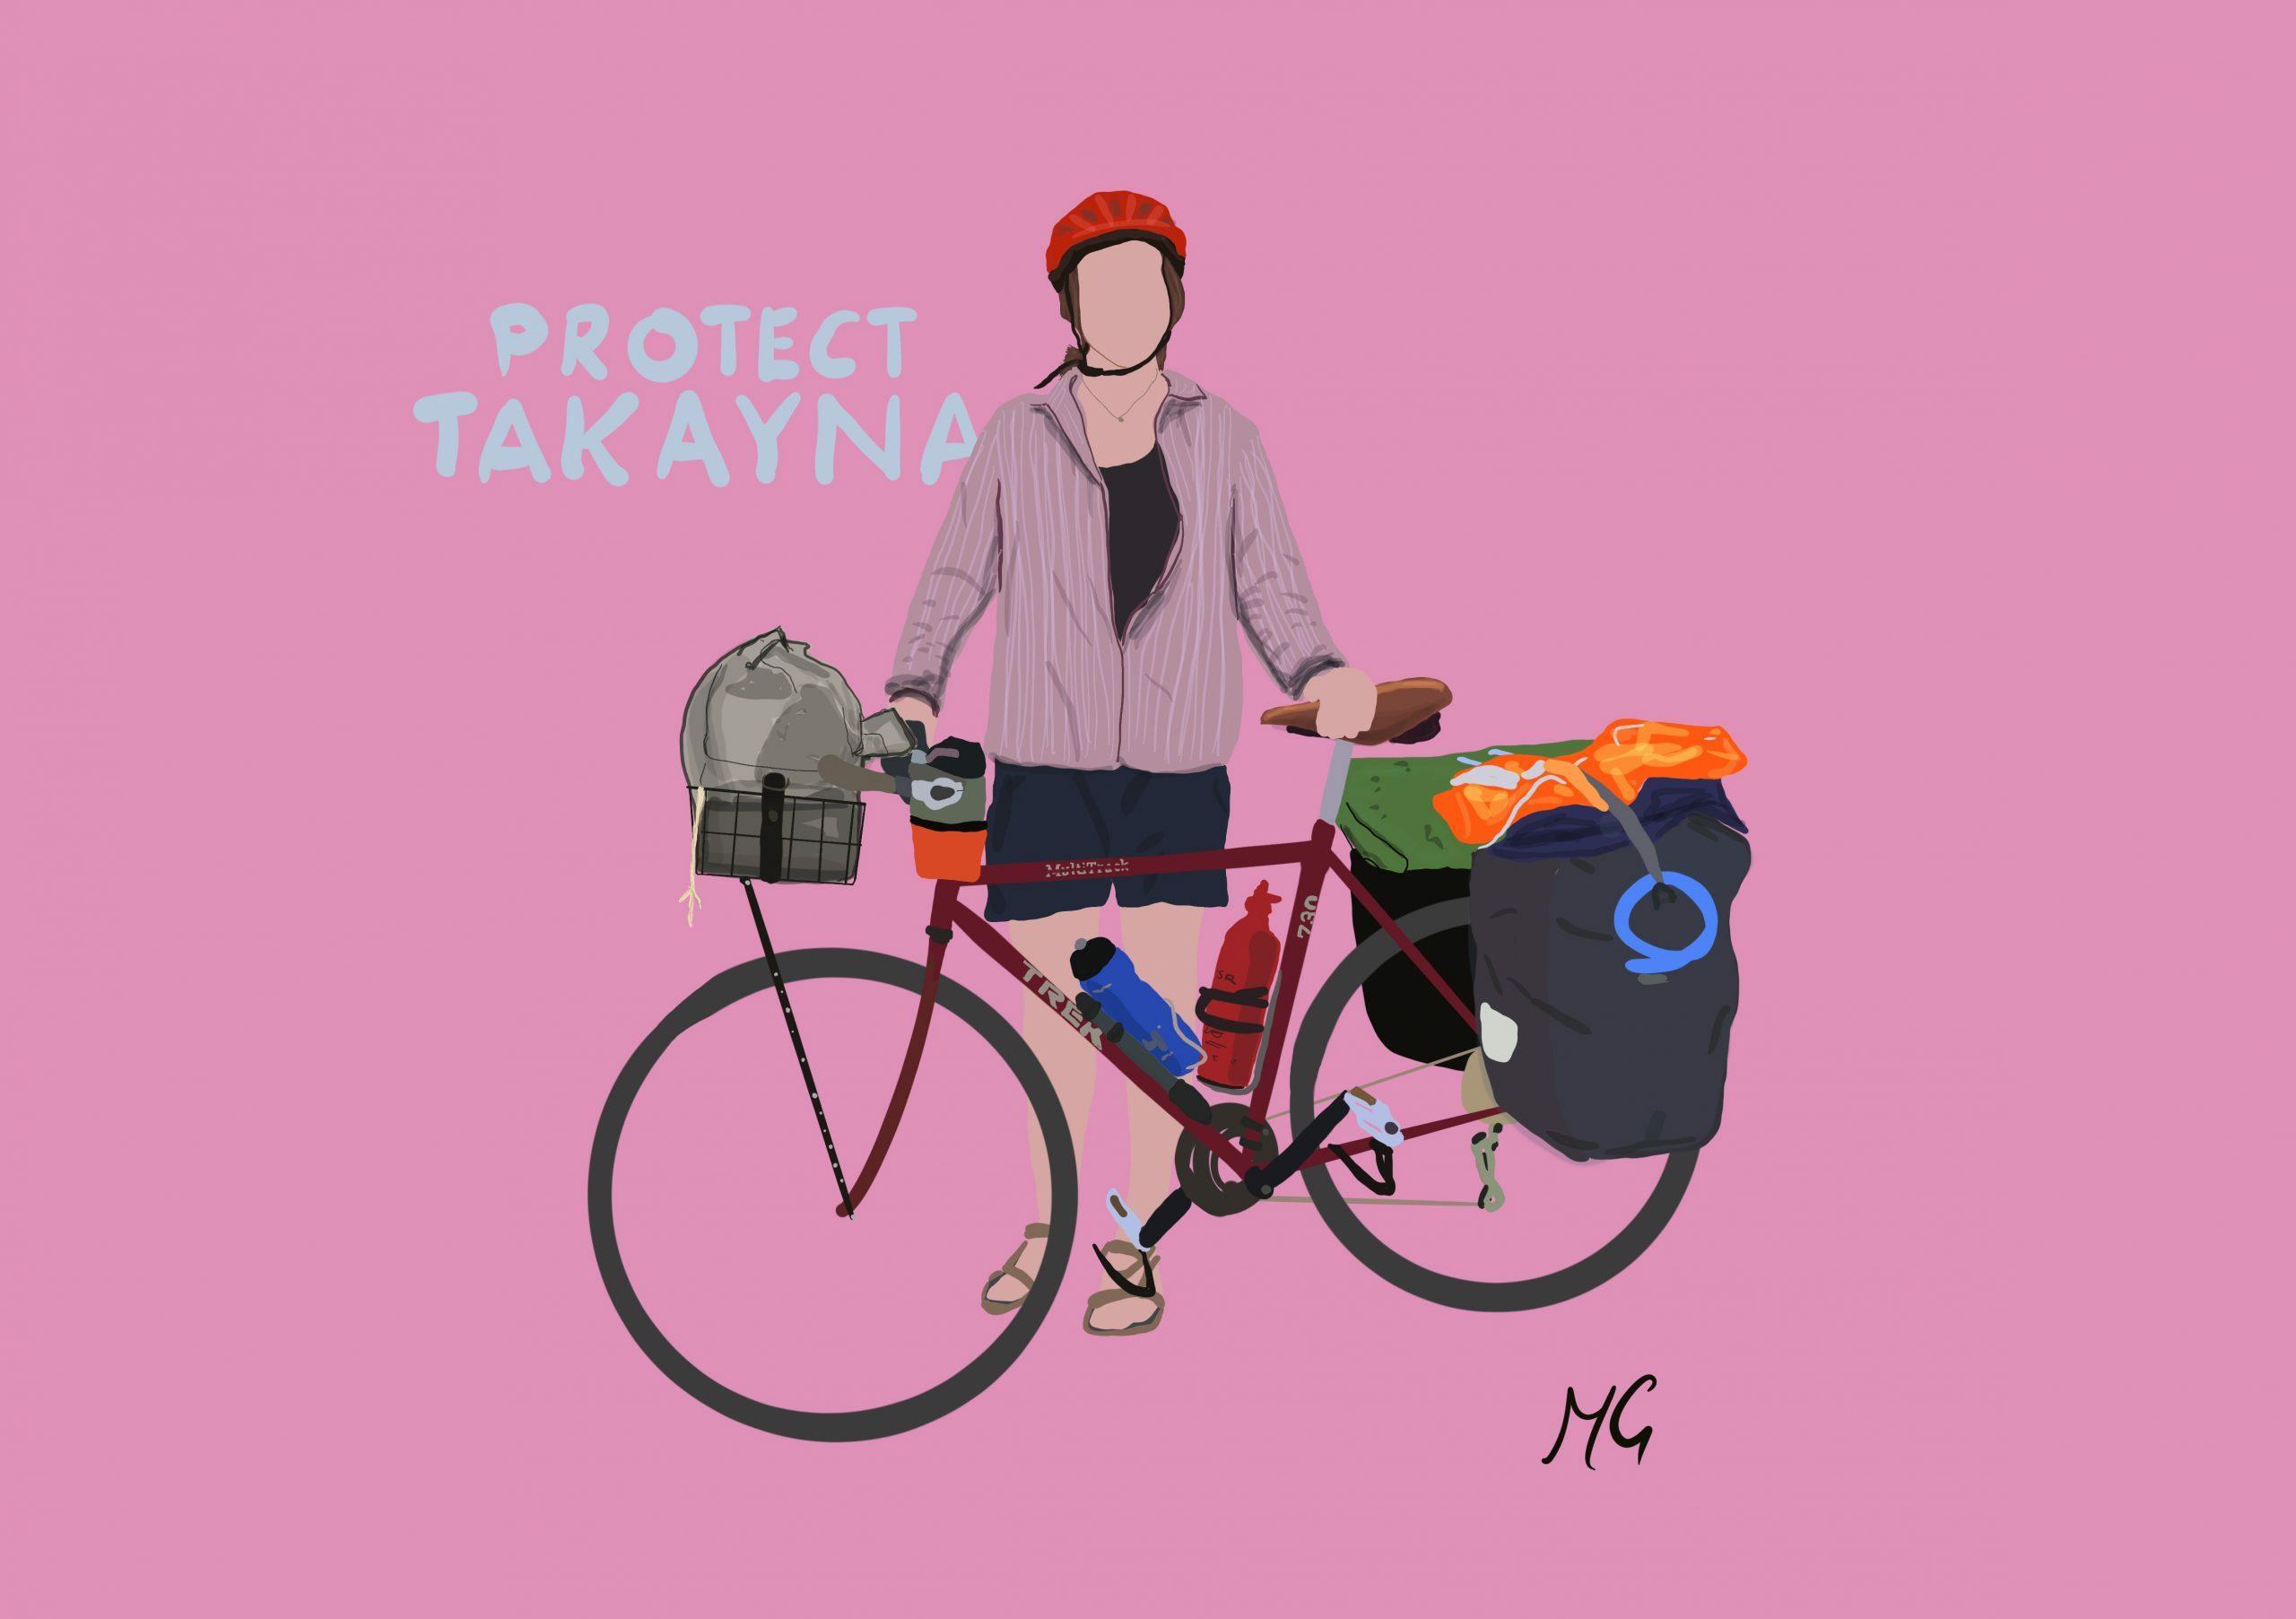 Tyla Bickley @Mattiedrawsbikes Mattie draws bikes bikepacking illustrations using procreate